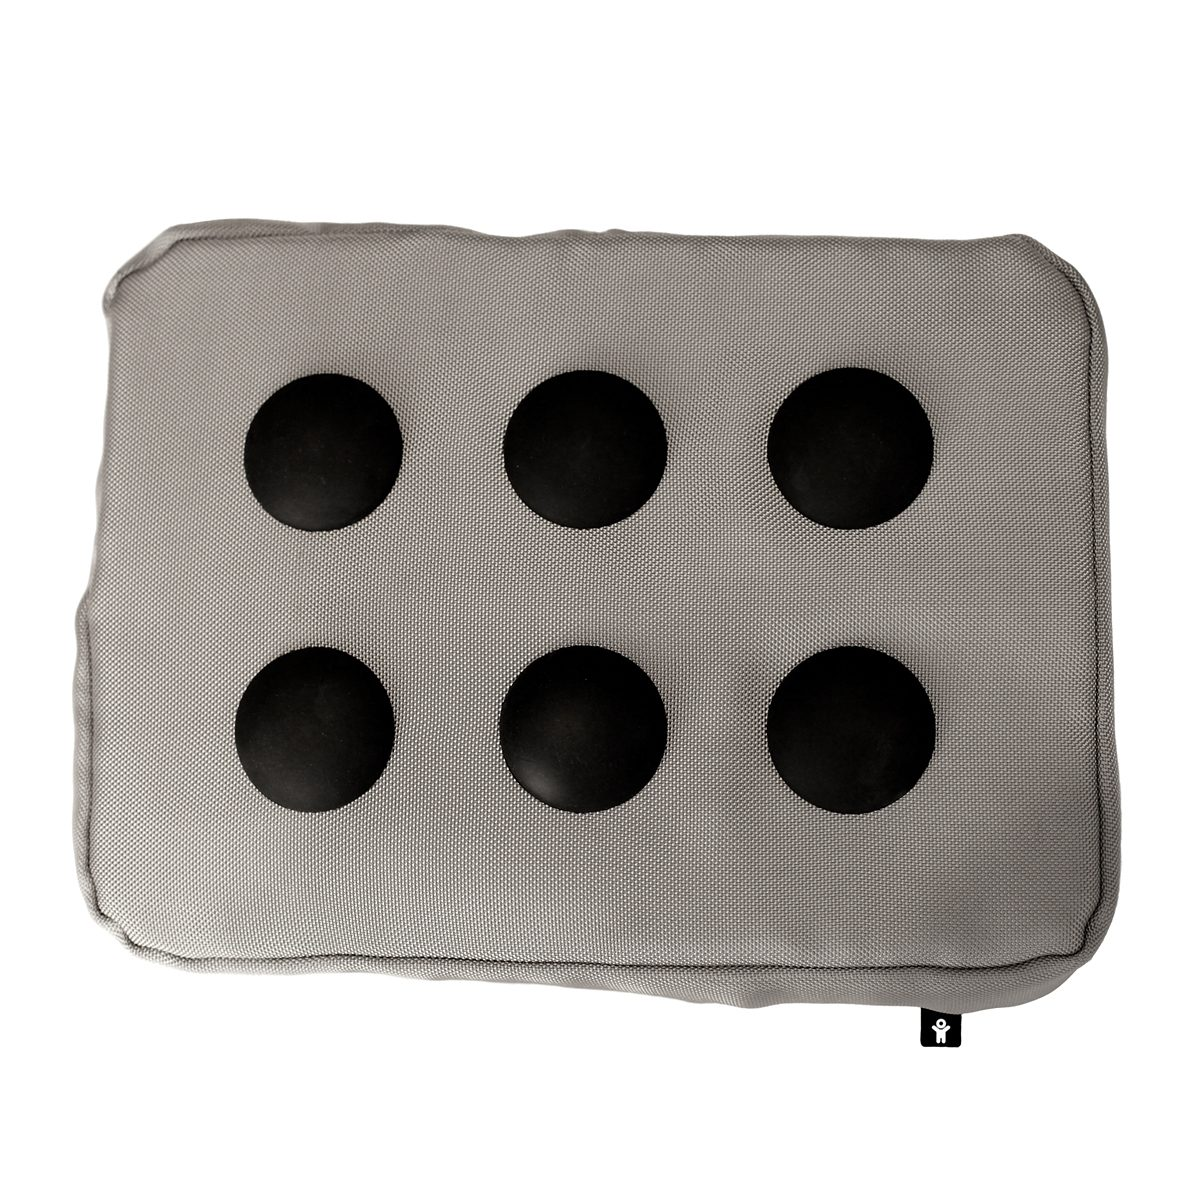 BOSIGN Bosign SURF PILLOW Laptop Kissen silber-schwarz Hitech Polyester